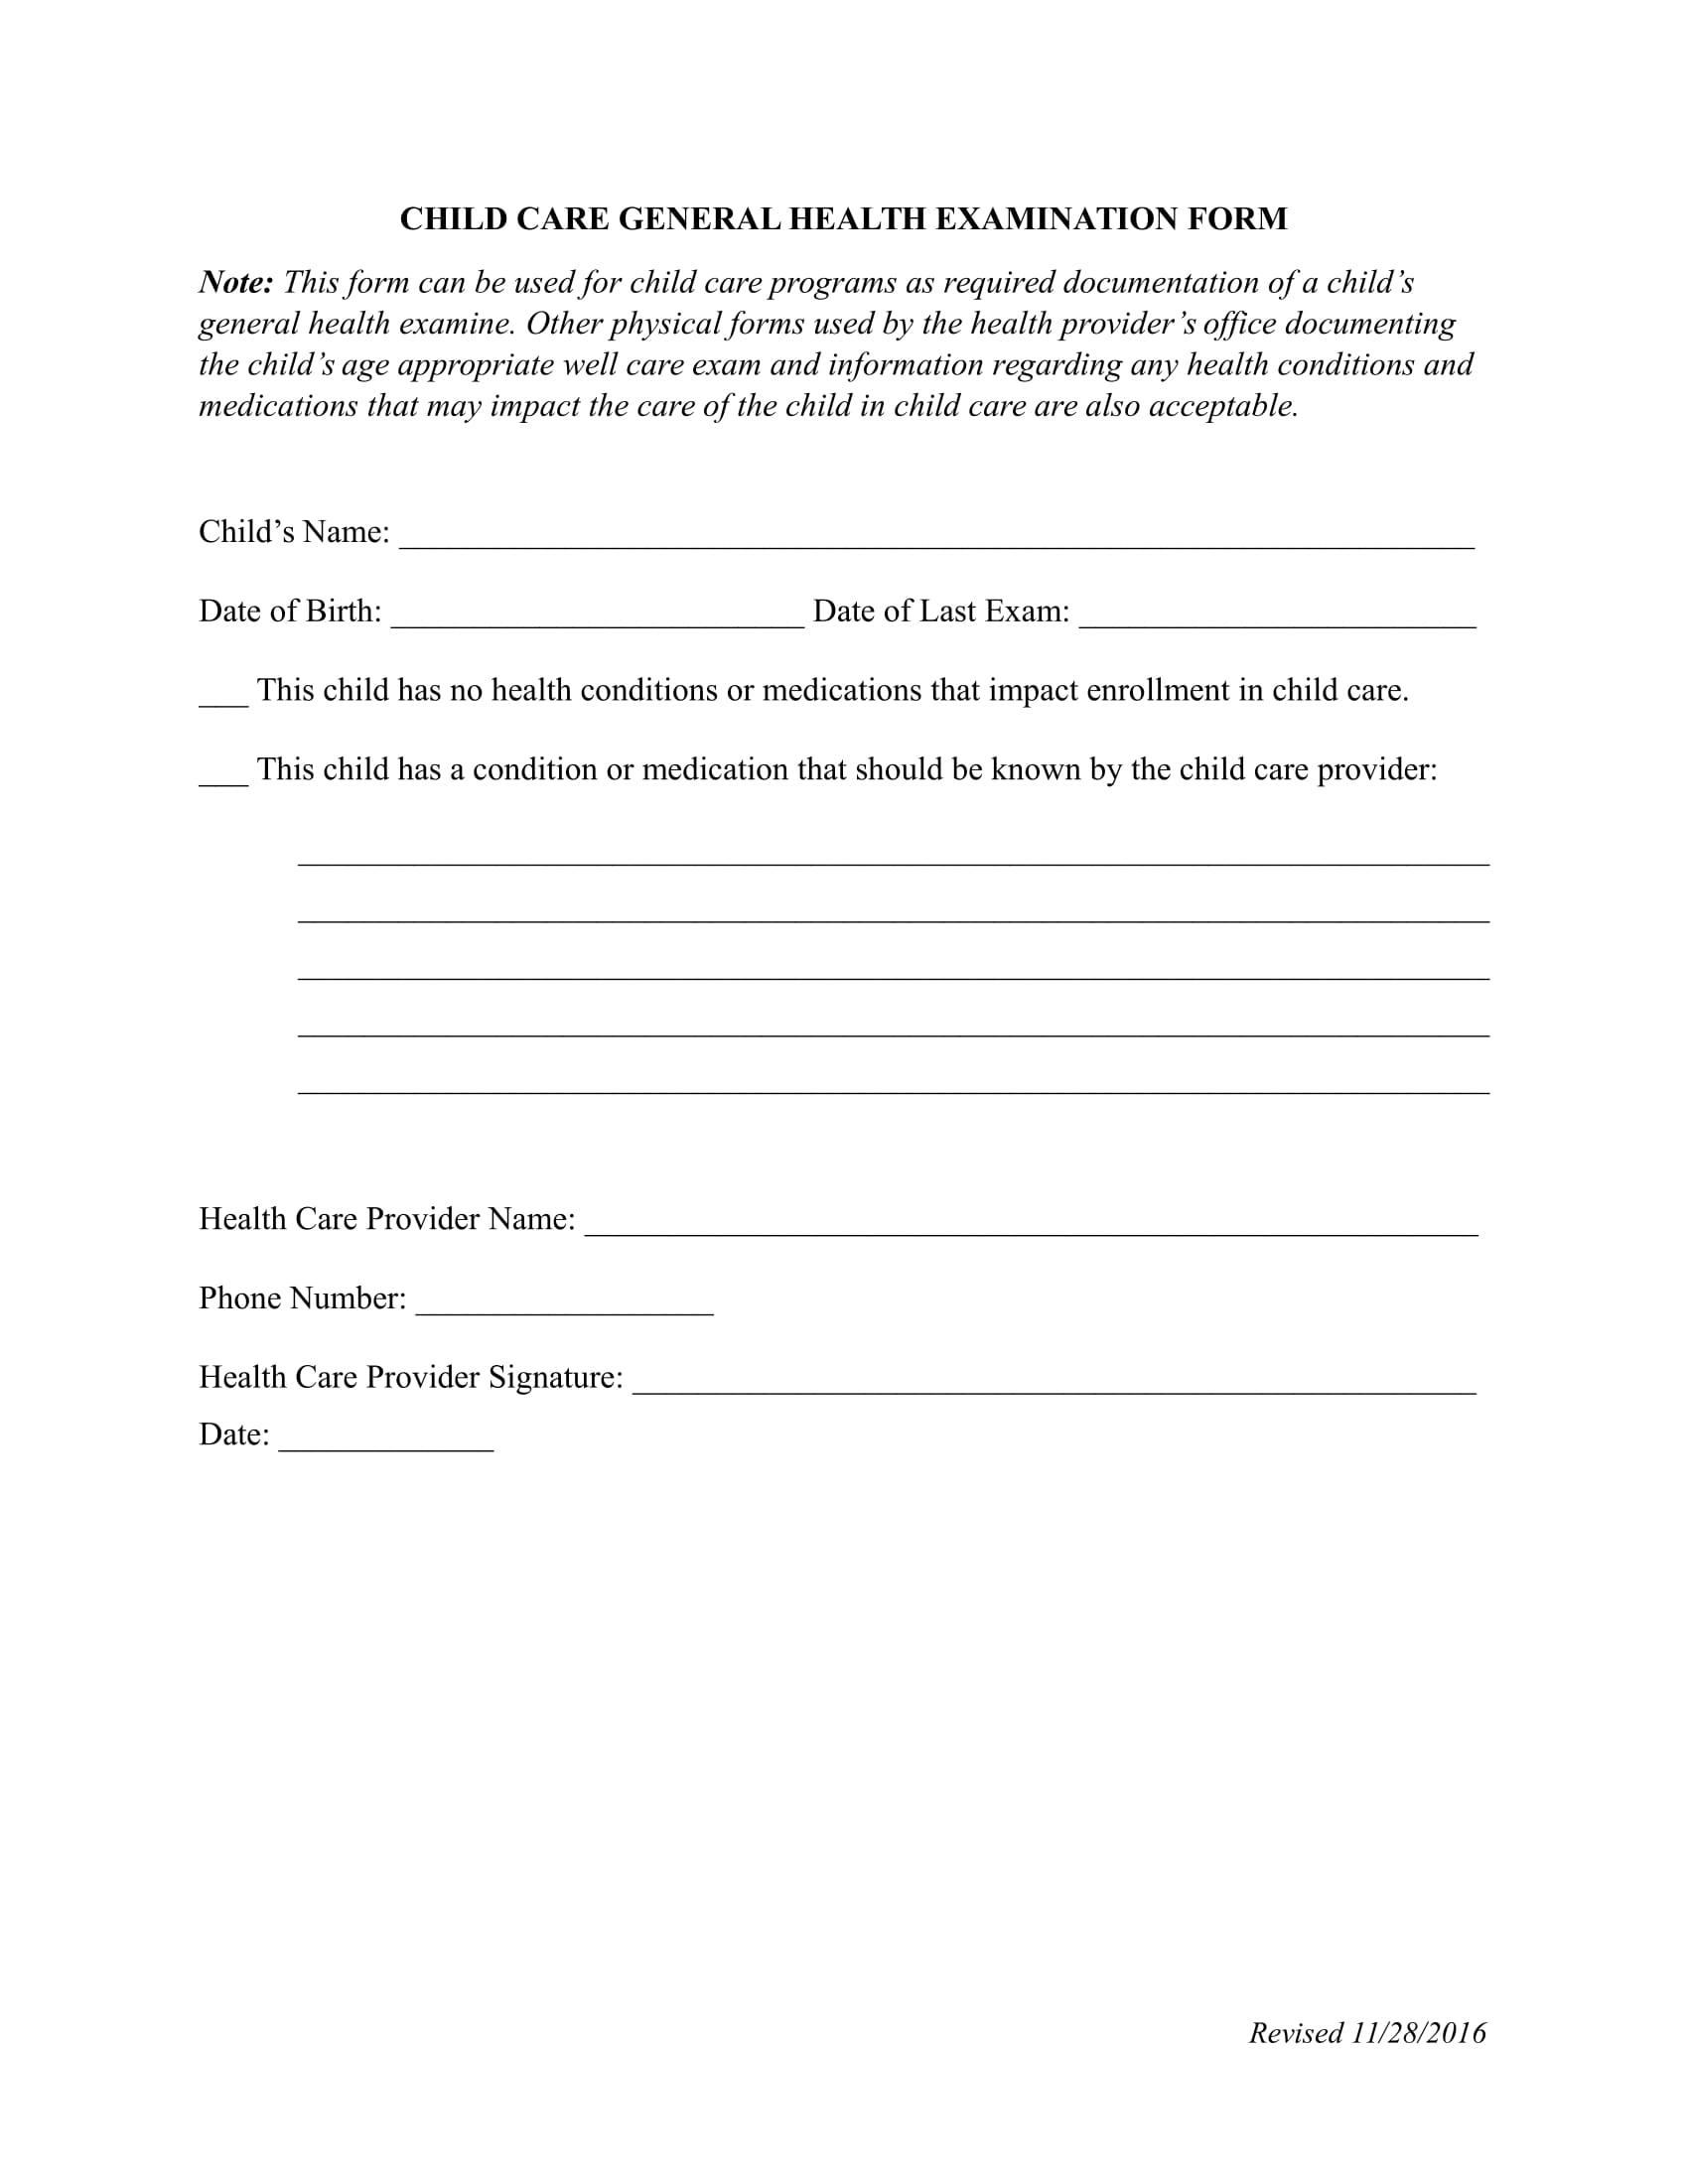 daycare child health exam information form 1